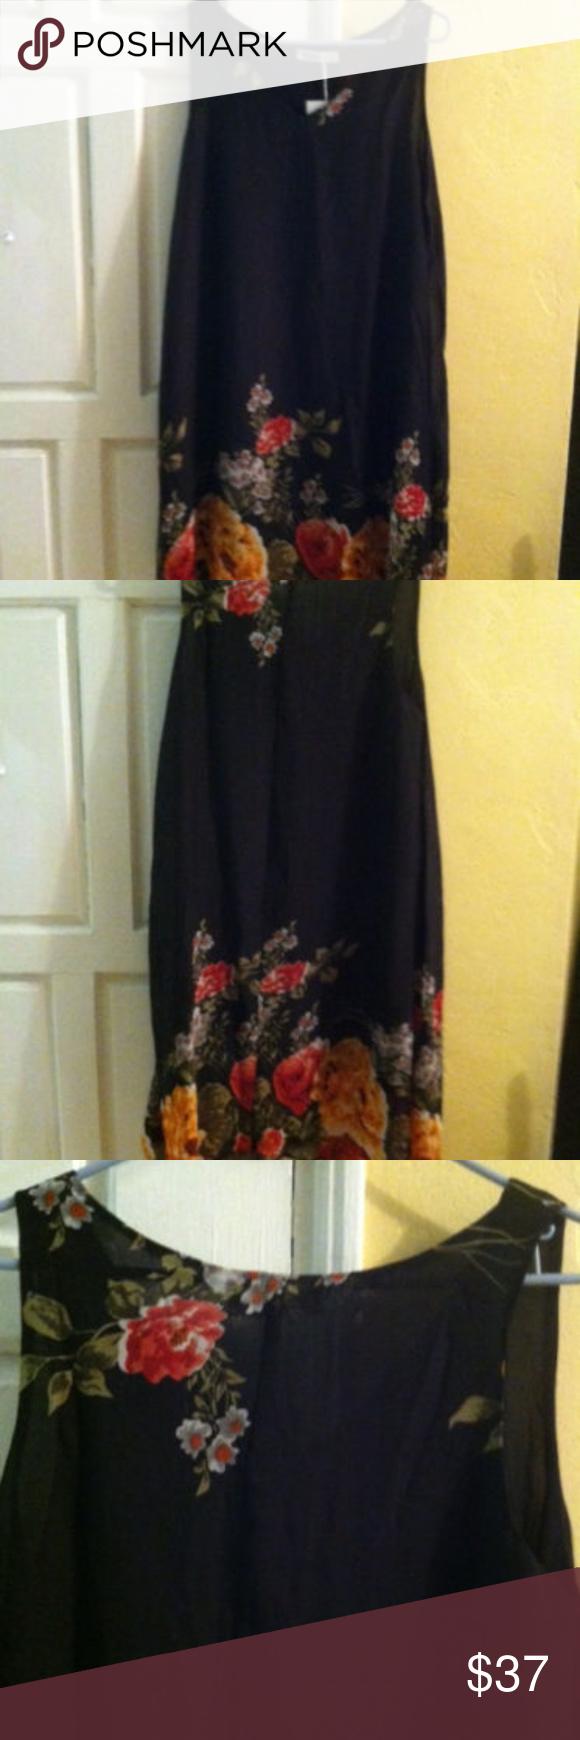 Nextima Black Dress Sz 14 Nwt Floral Handkerchief Nextima Midi Length Dress New With Tags Size 14 Handkerchief Clothes Design Fashion Design Comfortable Dress [ 1740 x 580 Pixel ]